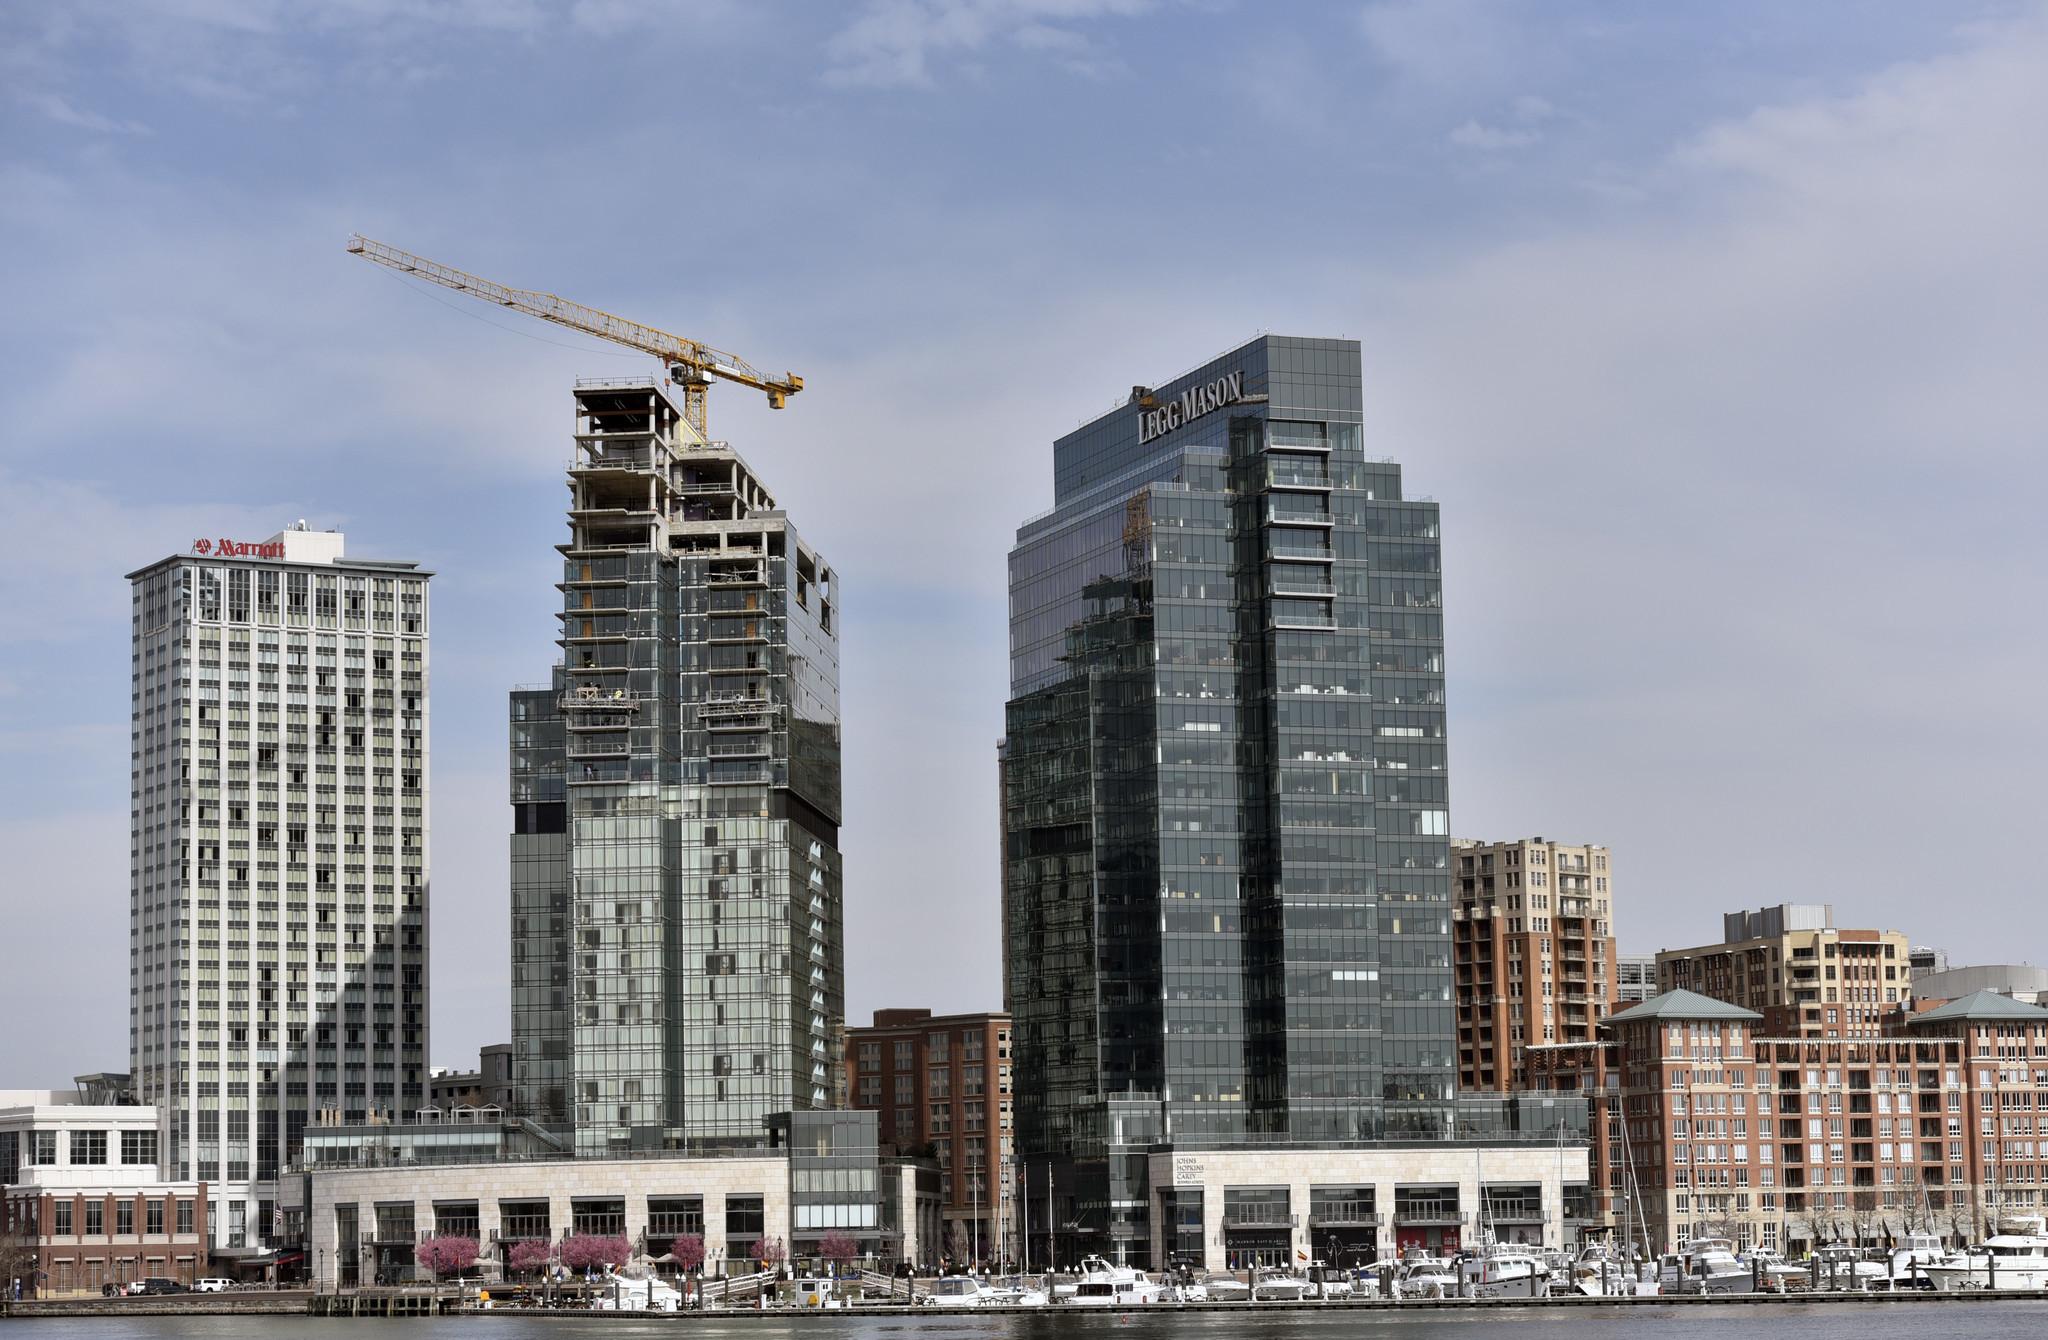 Despite decade of downsizing in Baltimore, Legg Mason remains